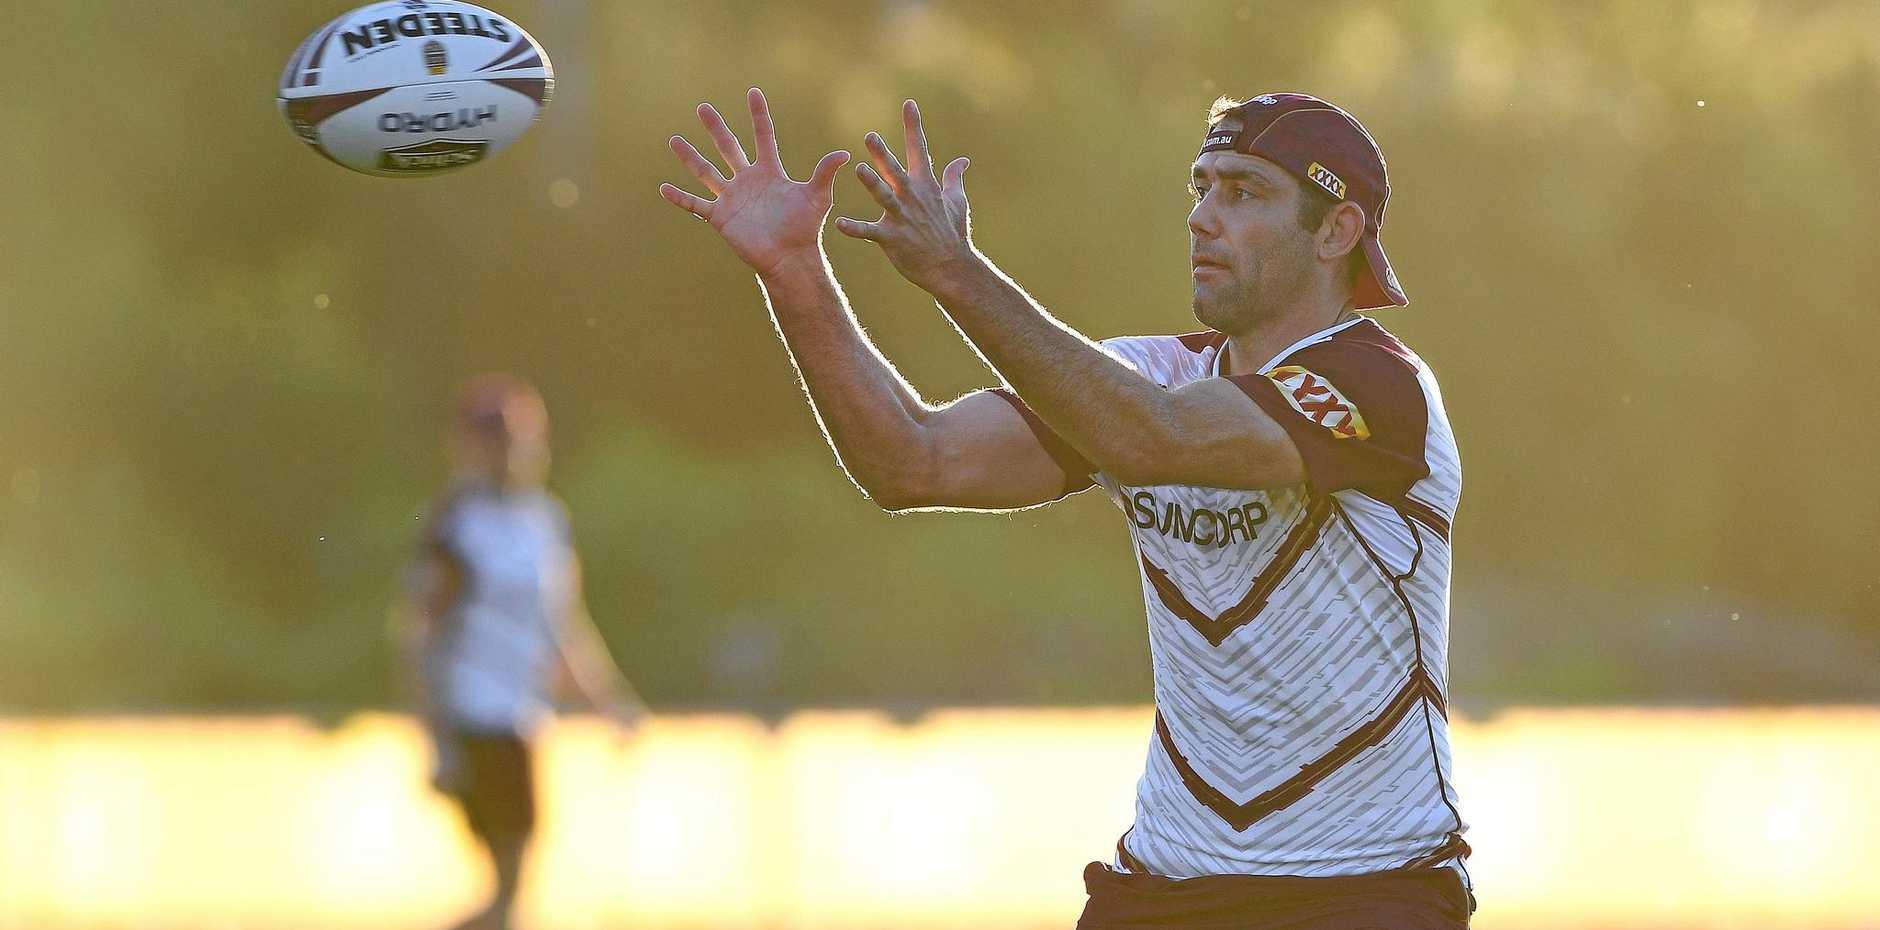 WON'T CHANGE MIND: Cameron Smith at Queensland State of Origin team training.